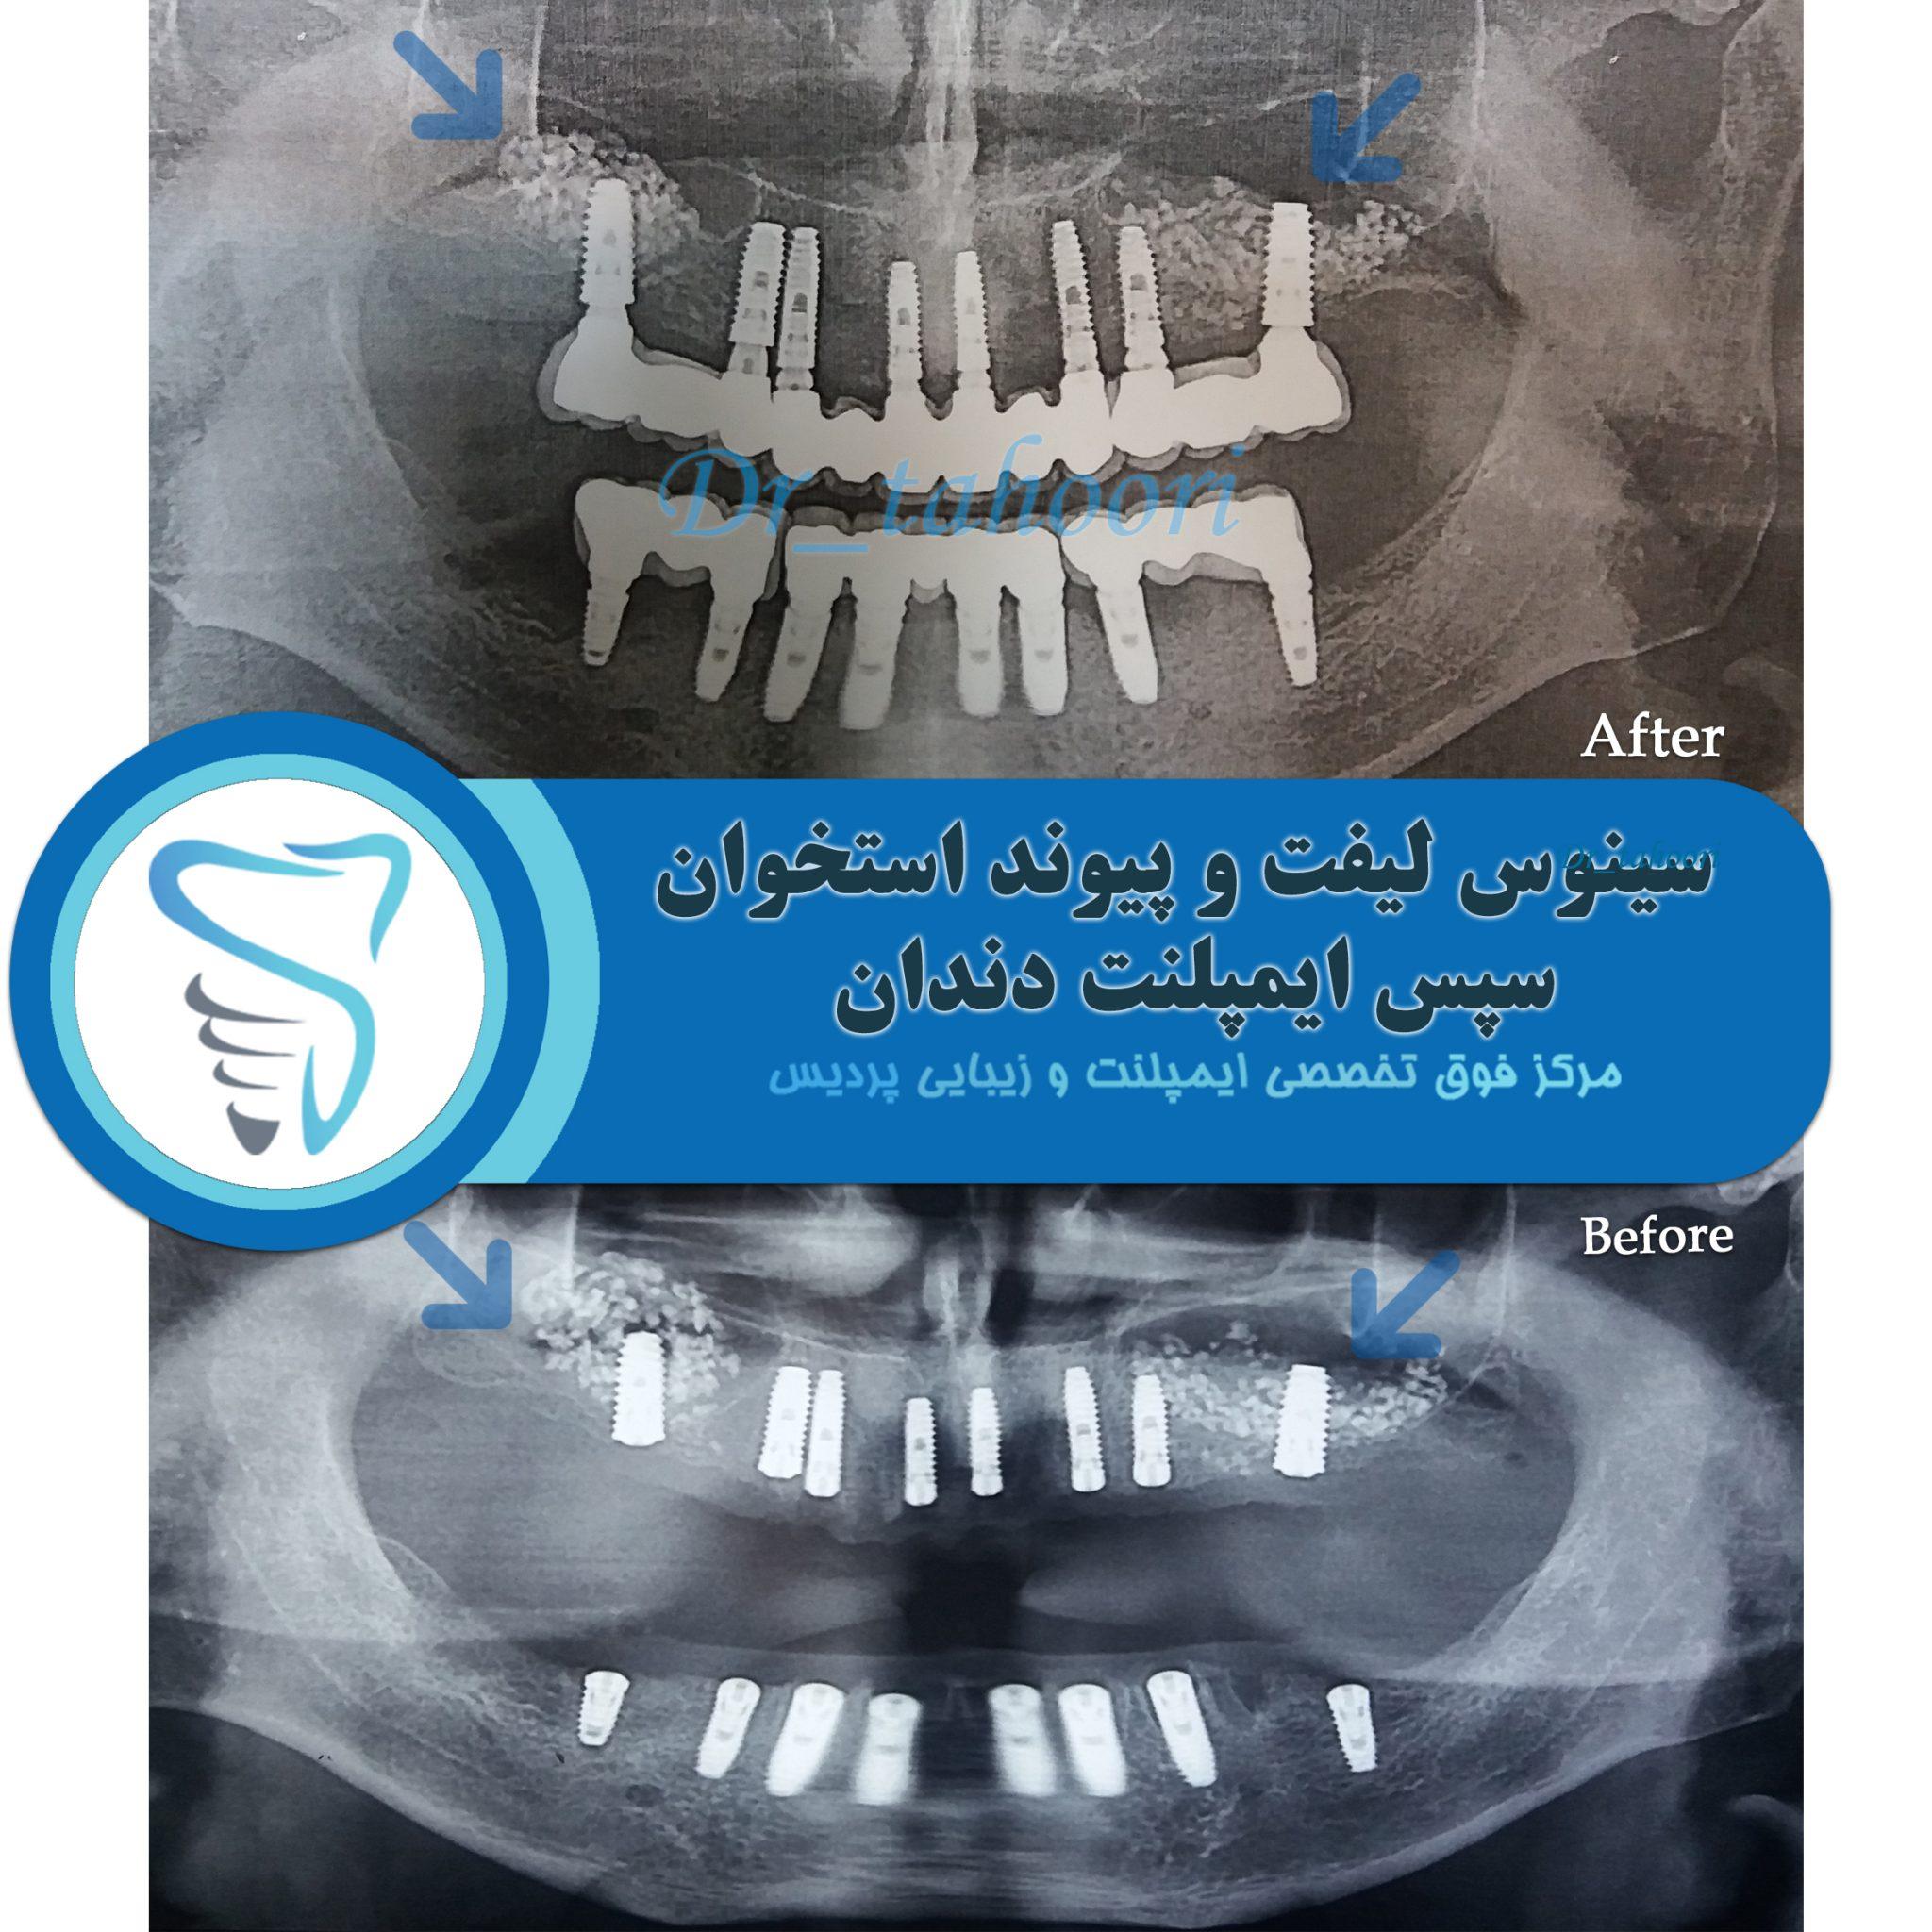 نمونه کار کلینیک دندانپزشکی پردیس